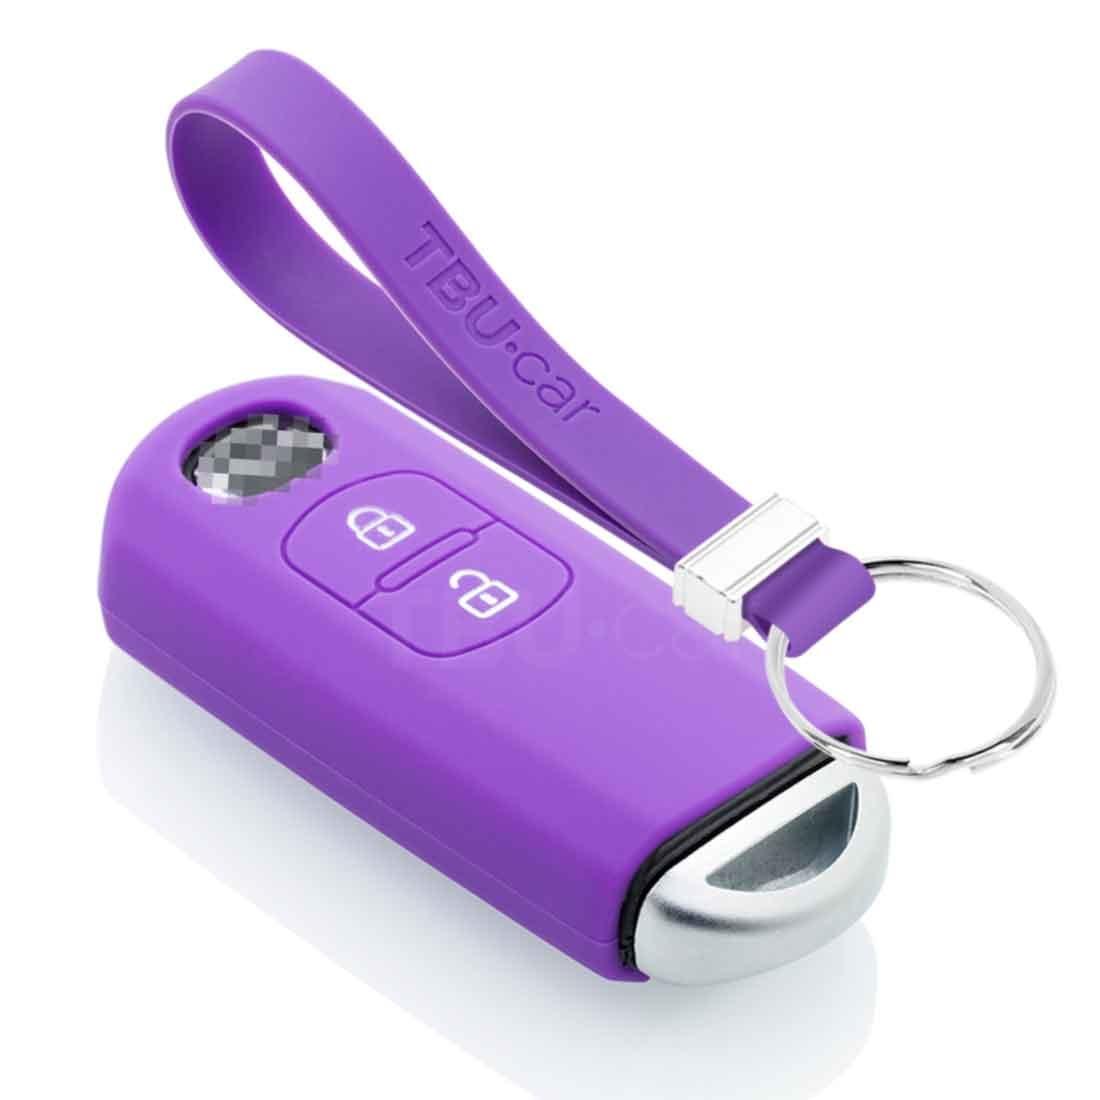 TBU car TBU car Sleutel cover compatibel met Mazda - Silicone sleutelhoesje - beschermhoesje autosleutel - Paars